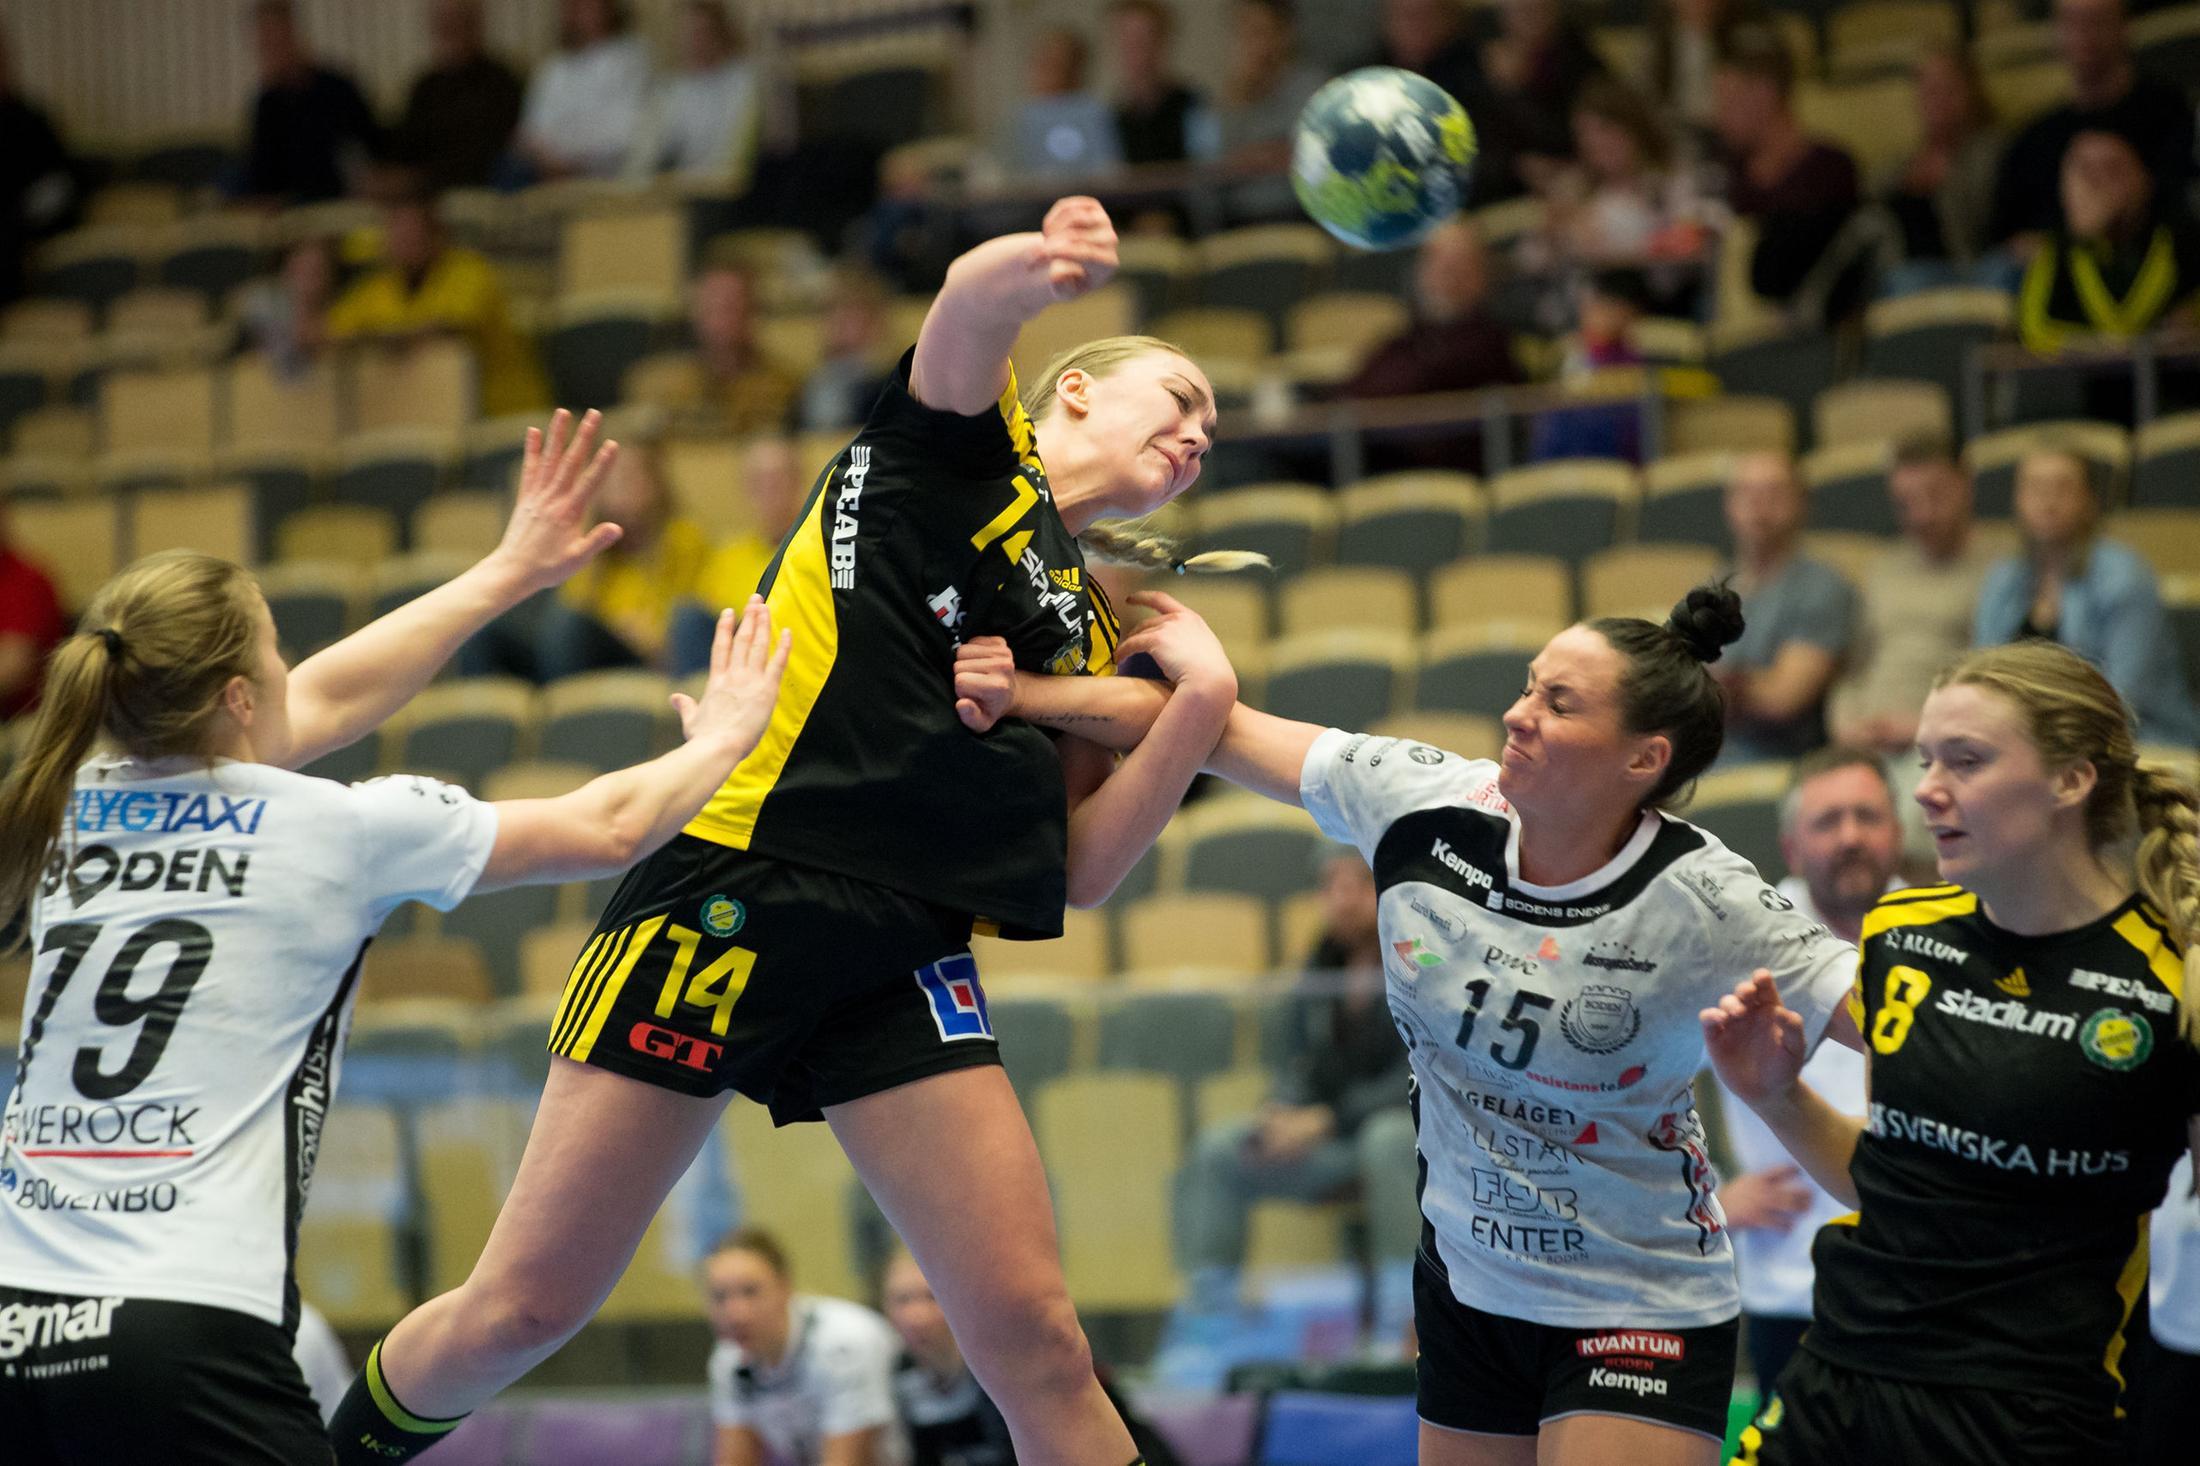 Handboll2CSHE2CKvartsfinal12CSC3A4vehof-Bodenjpg